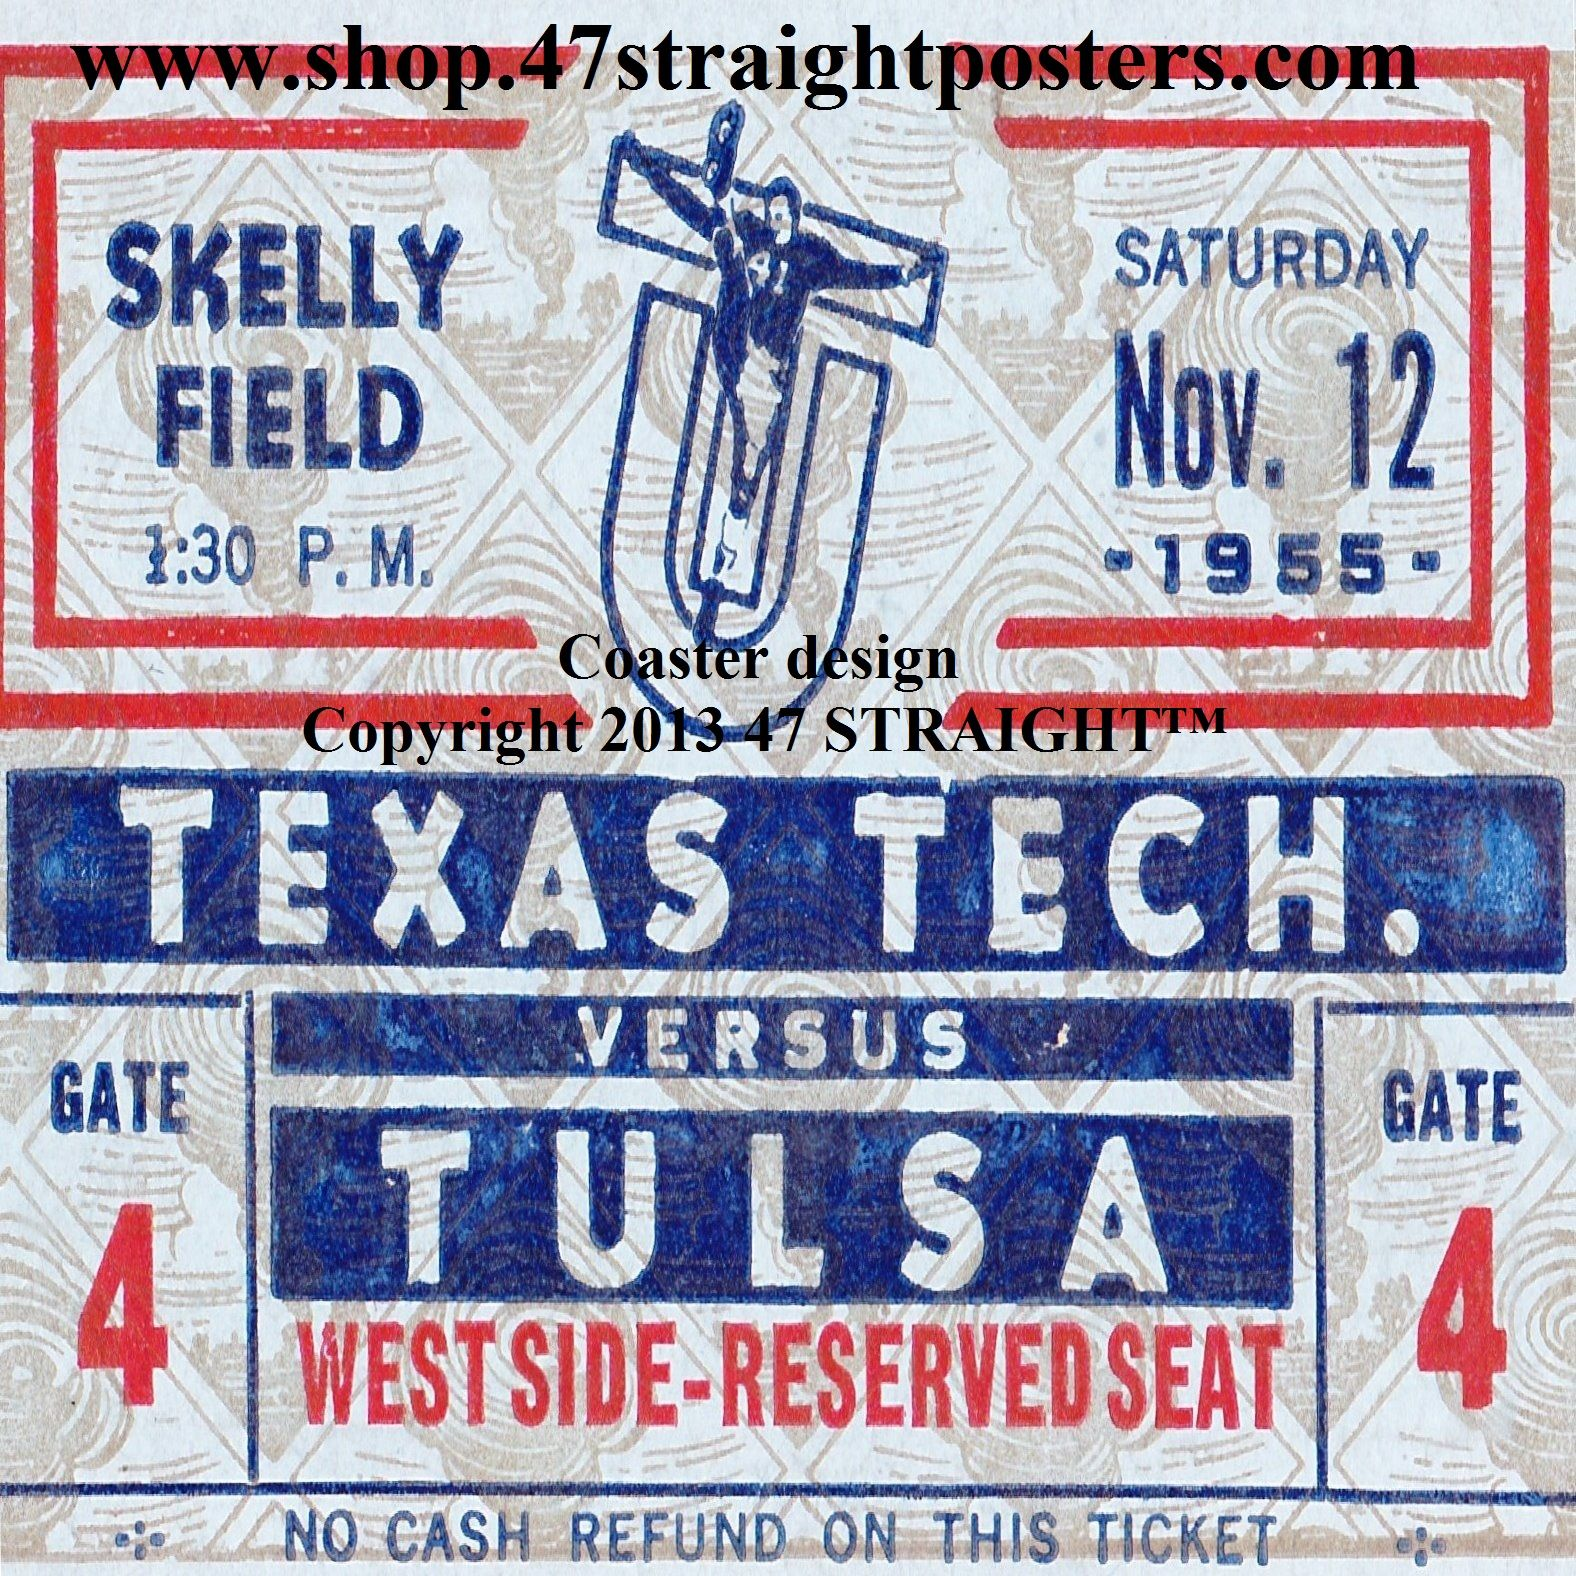 Tulsa football gifts. Available soon! 1955 Texas Tech vs